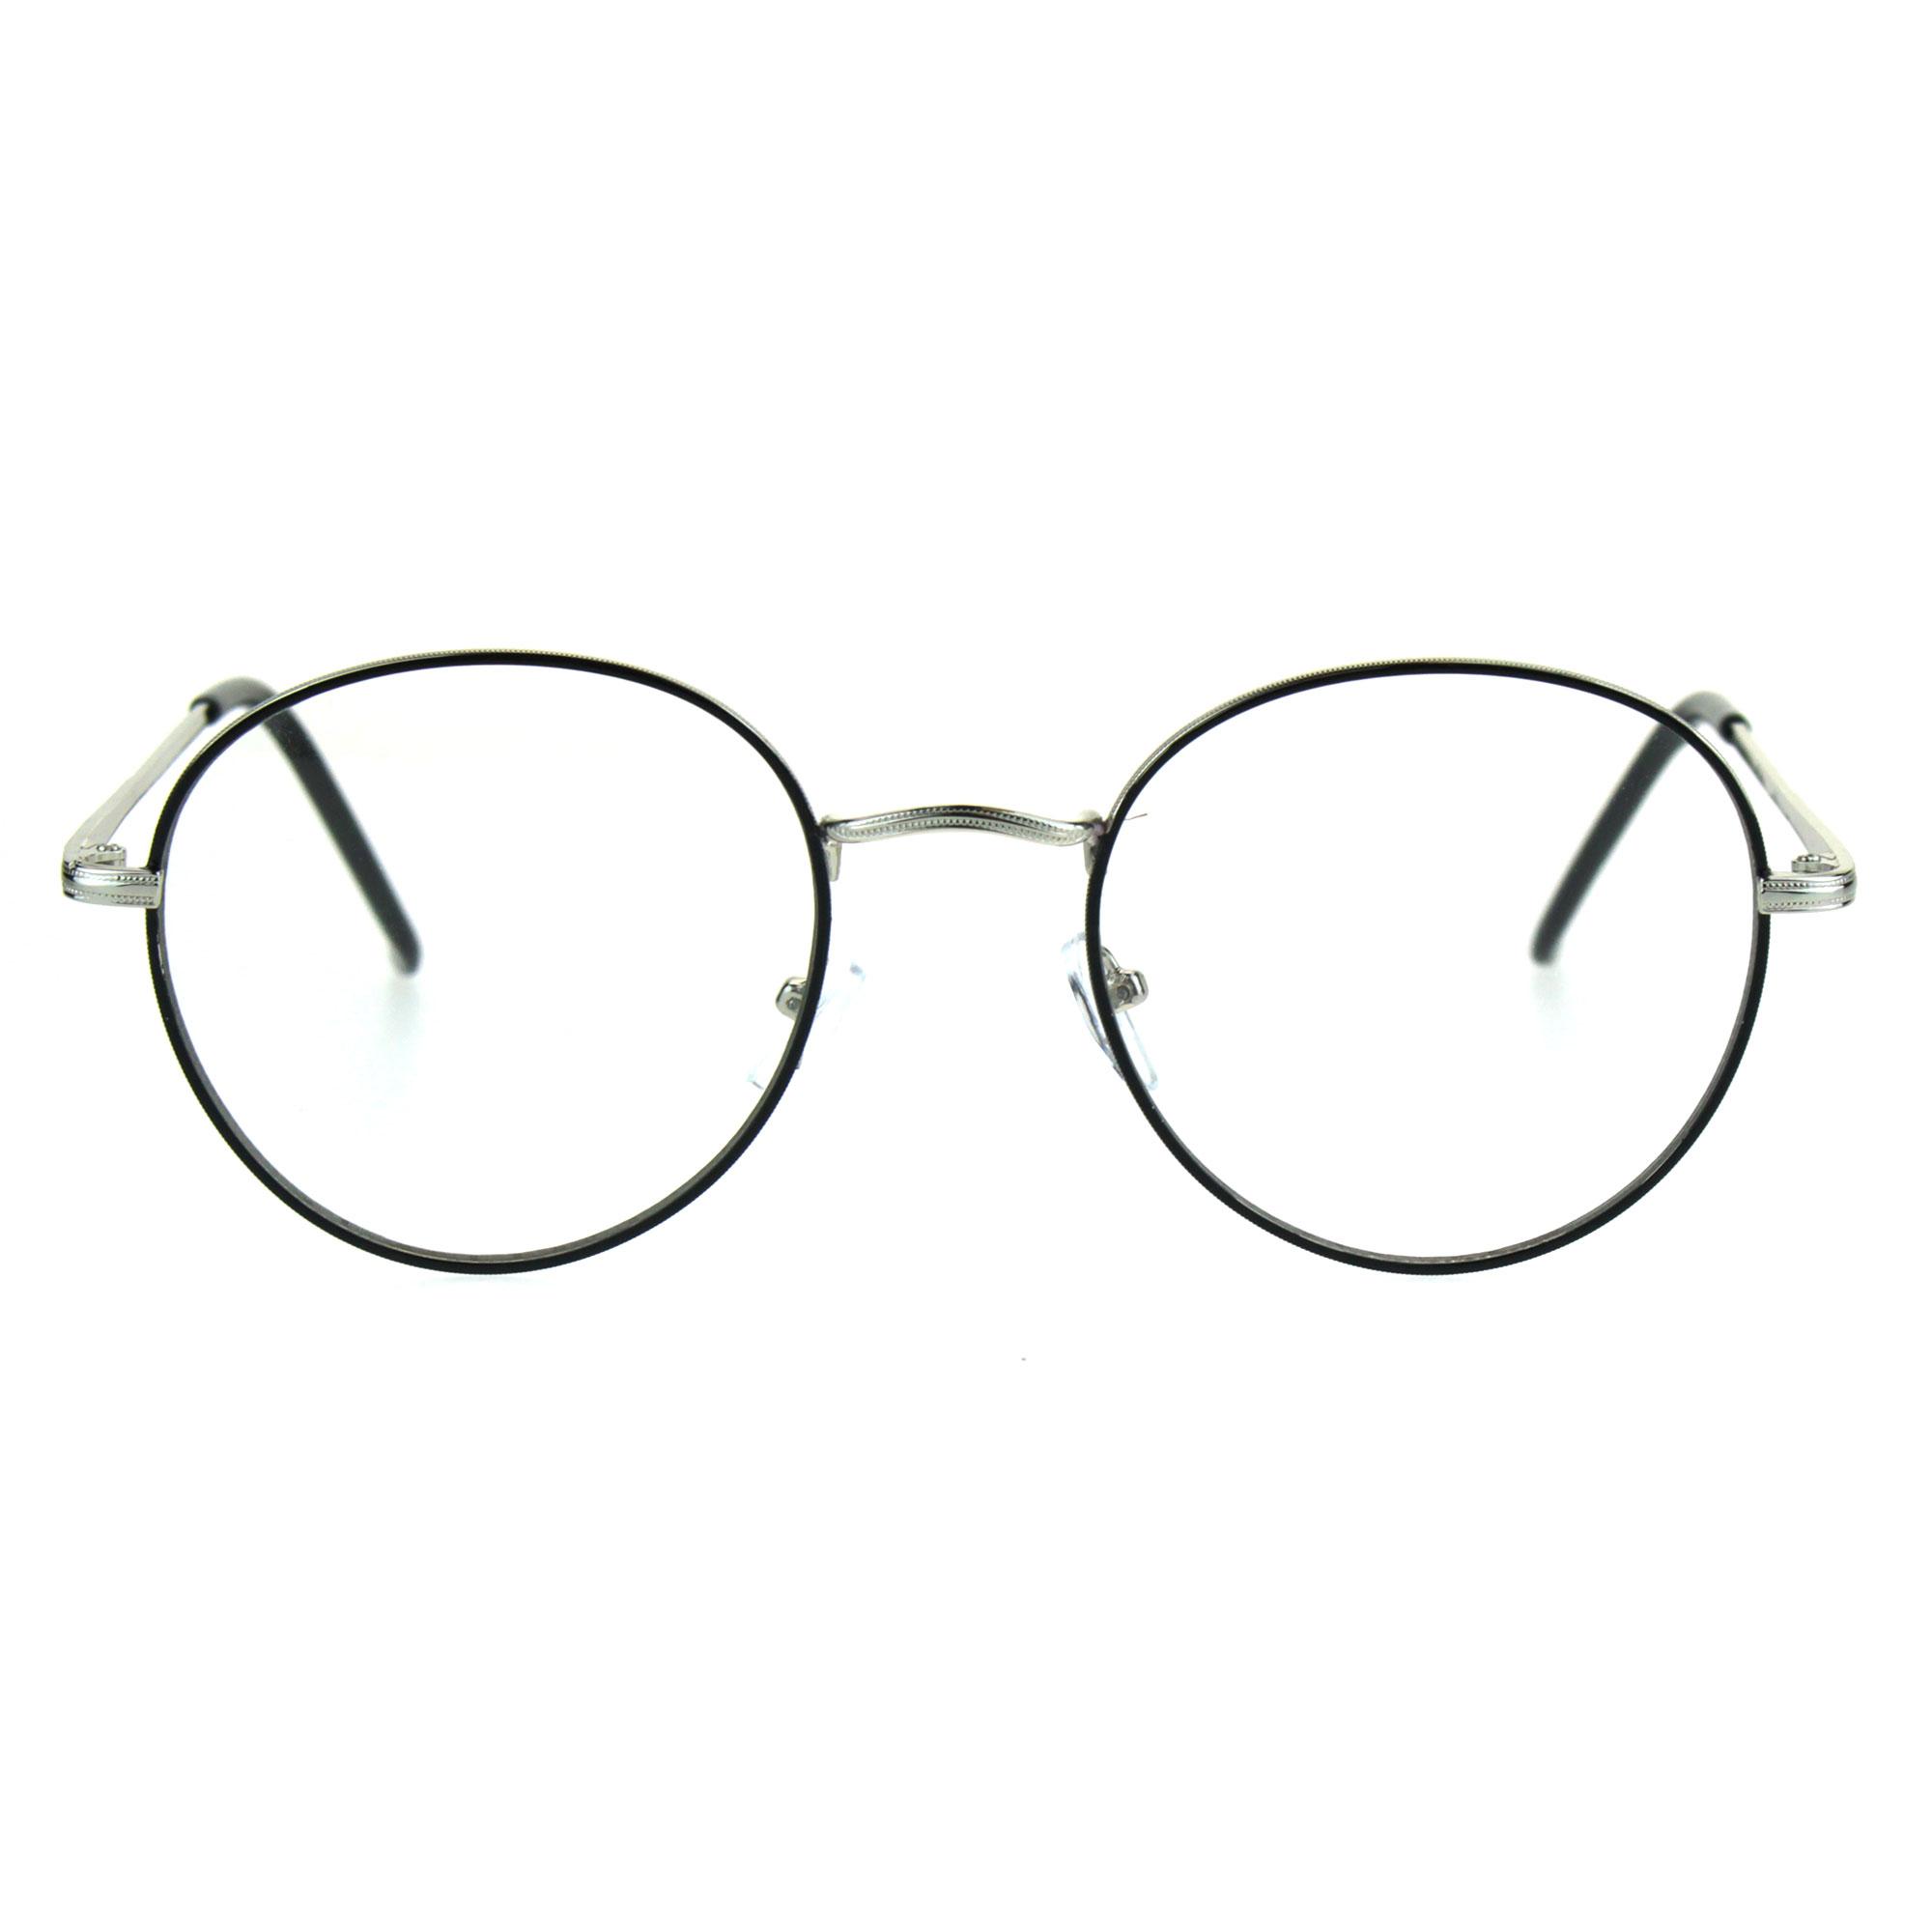 Classic 90s Metal Rim Round Oval Clear Lens Eye Glasses Frame | eBay